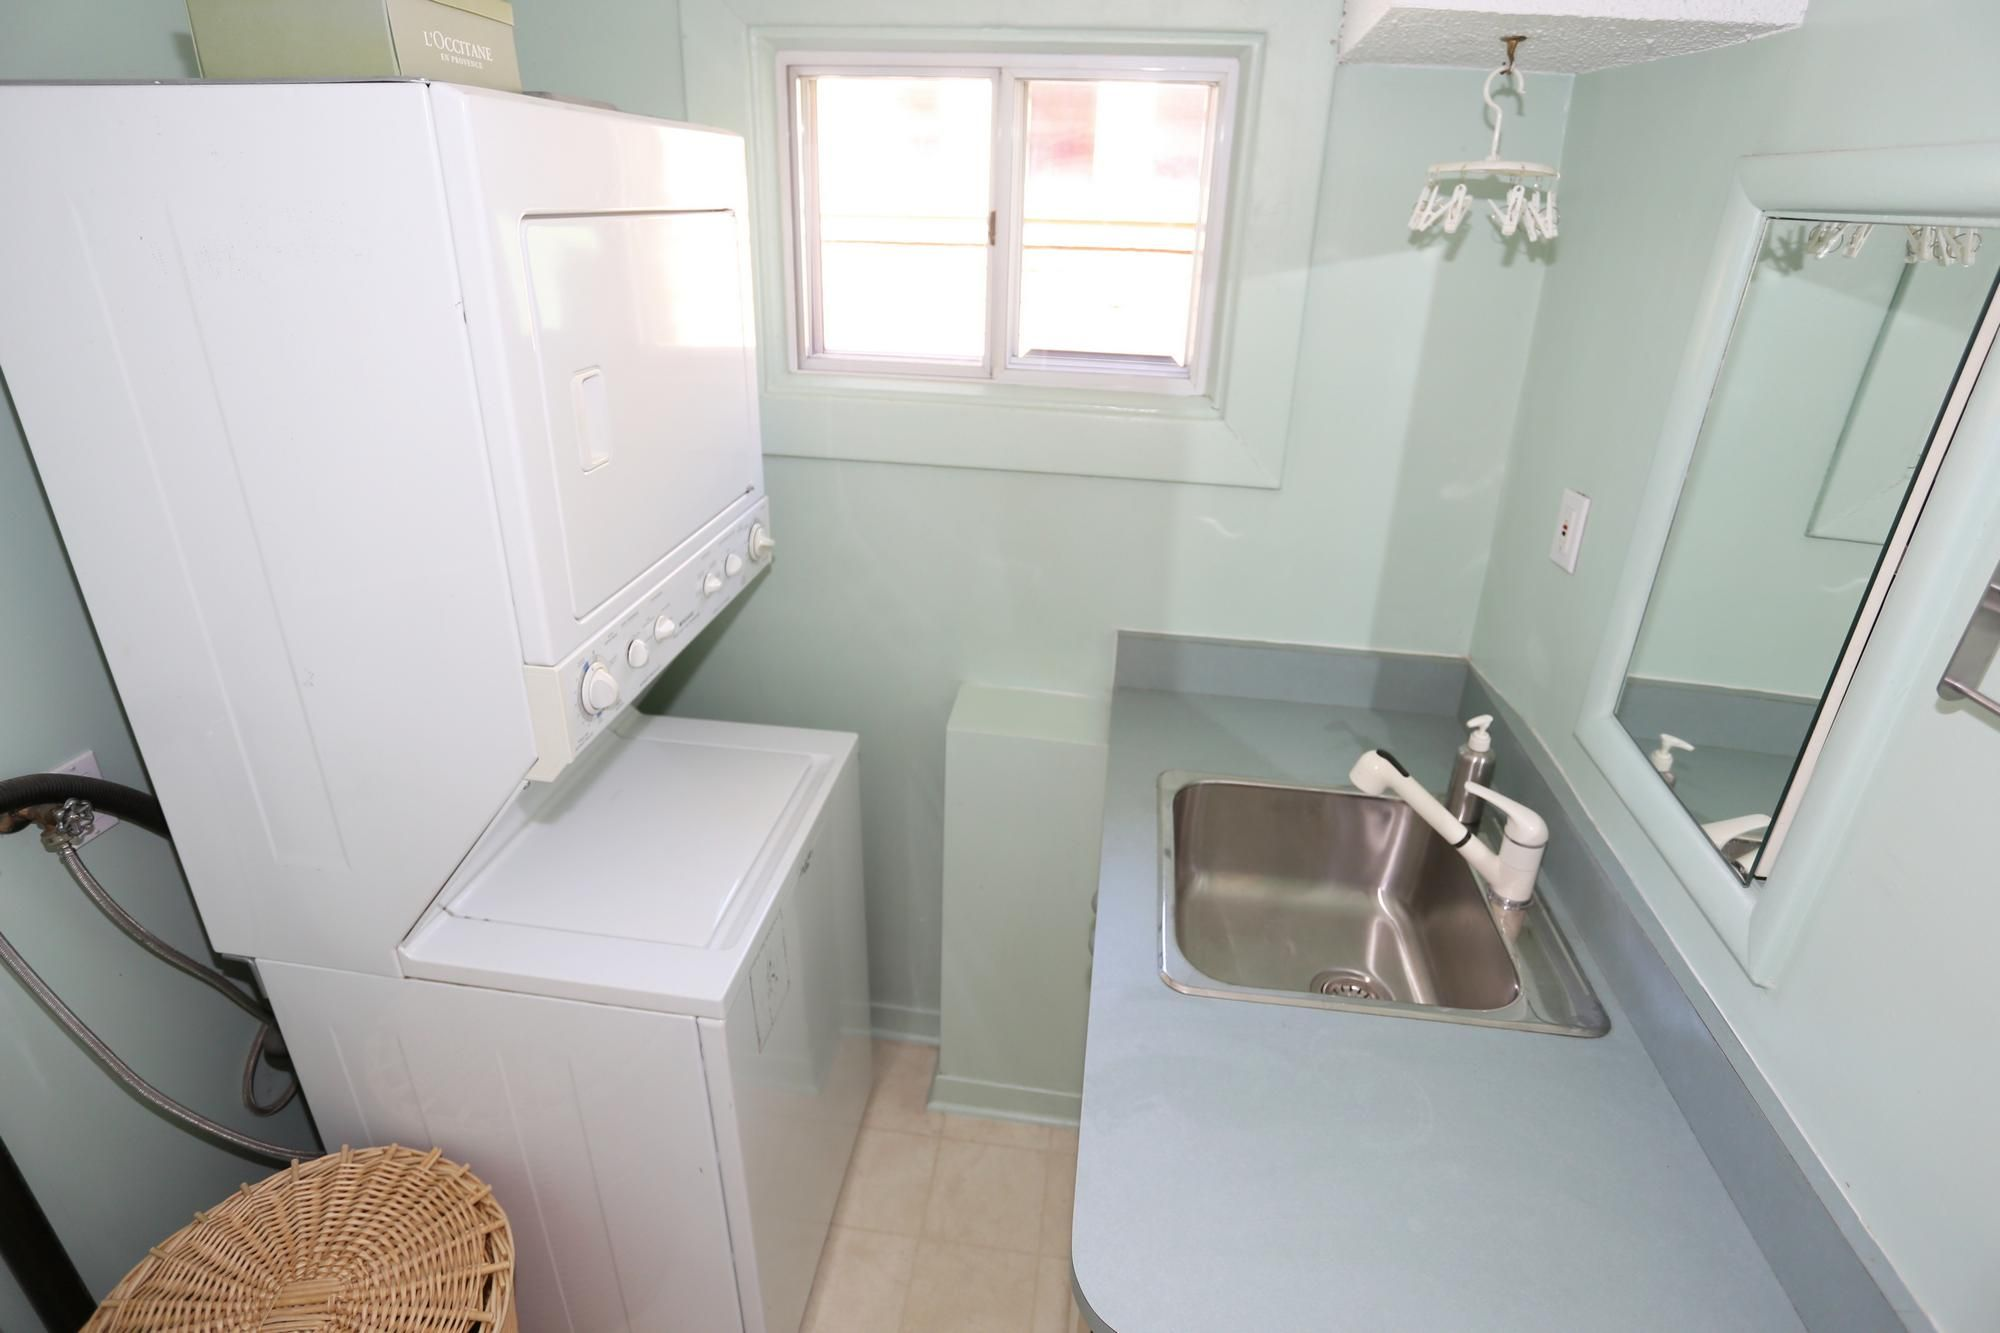 Photo 26: Photos: 96 Home Street in Winnipeg: Wolseley Single Family Detached for sale (5B)  : MLS®# 1810985